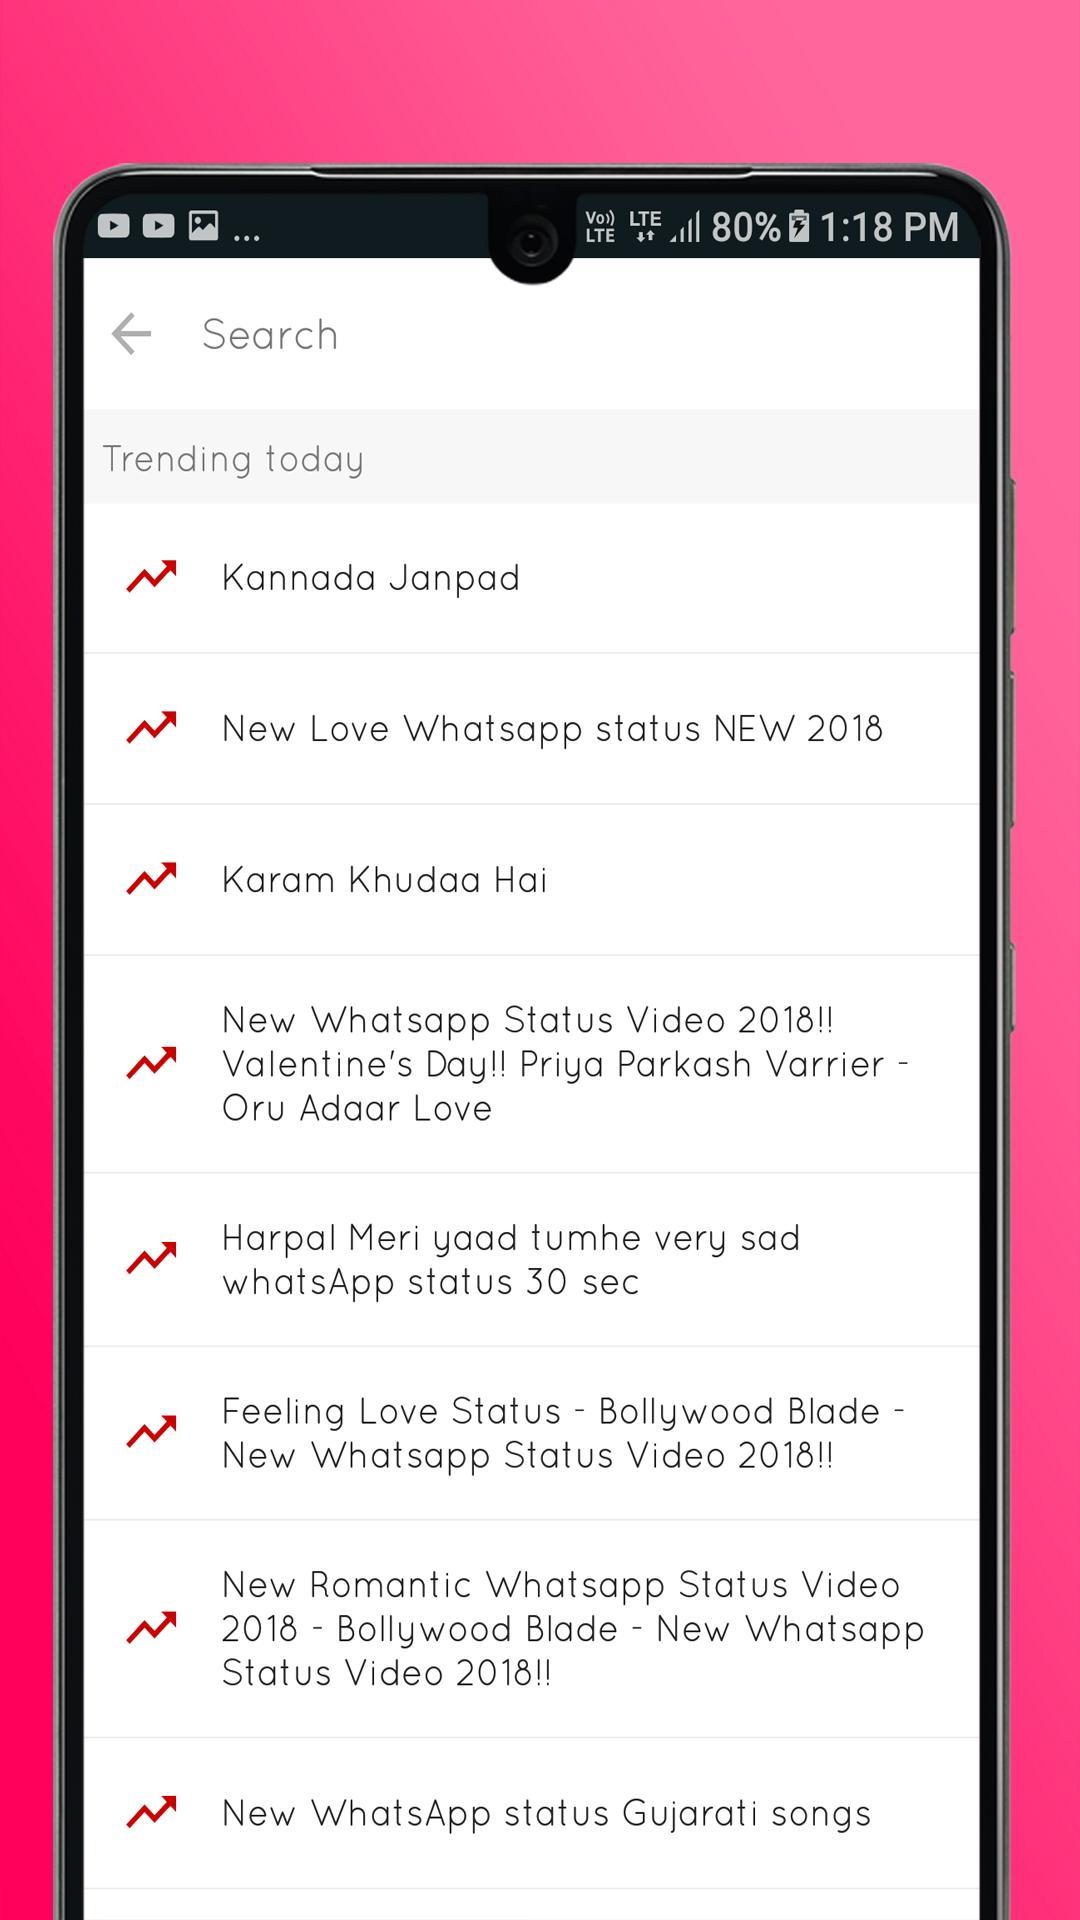 new whatsapp status video download 30 sec